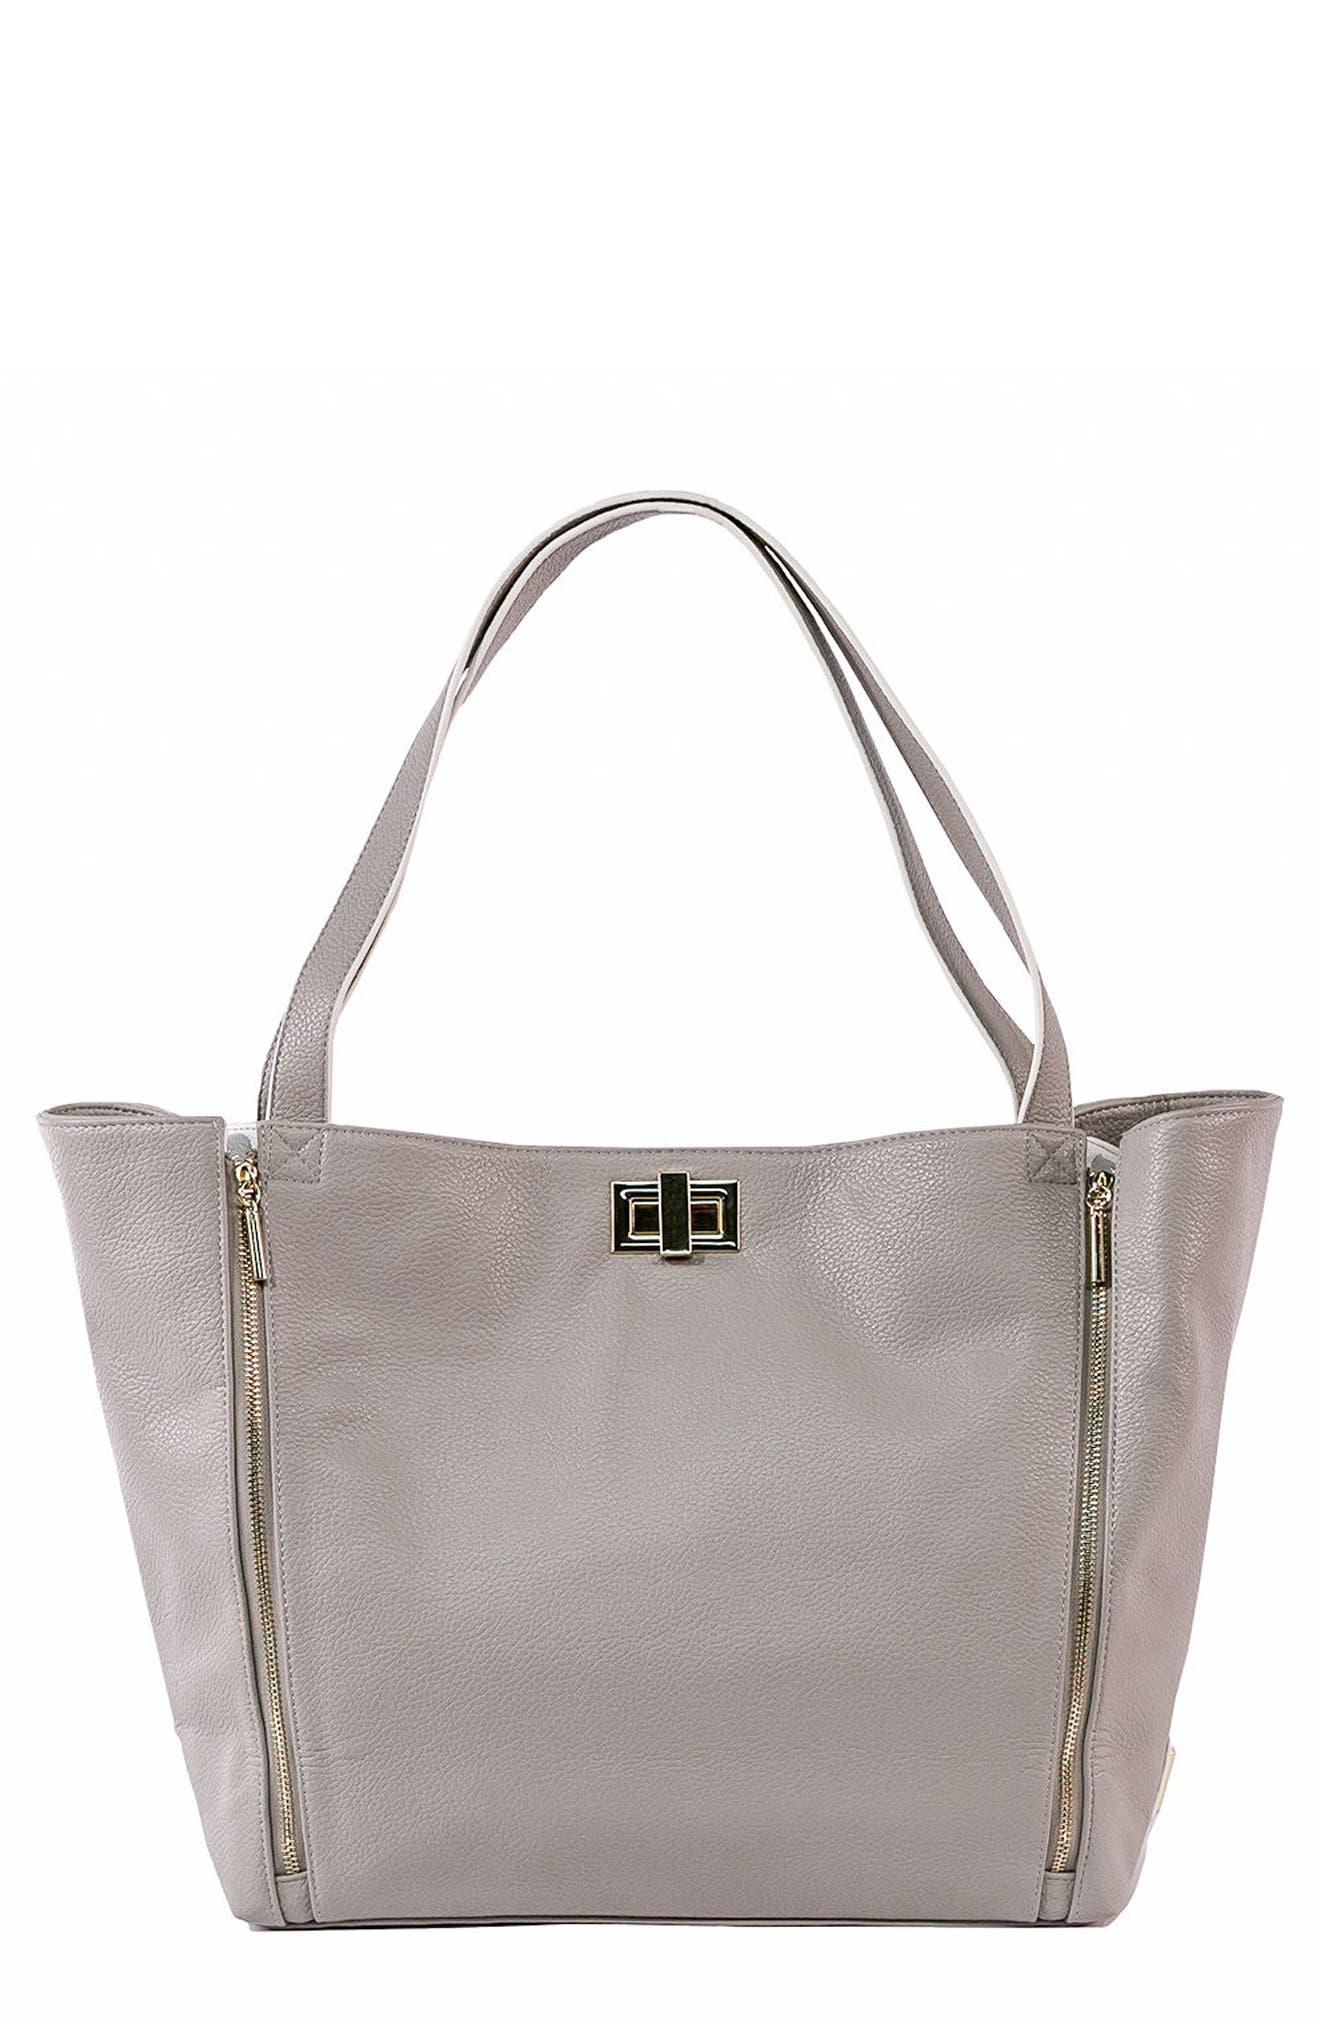 Sloane Diaper Bag,                             Main thumbnail 1, color,                             Neutral/ White